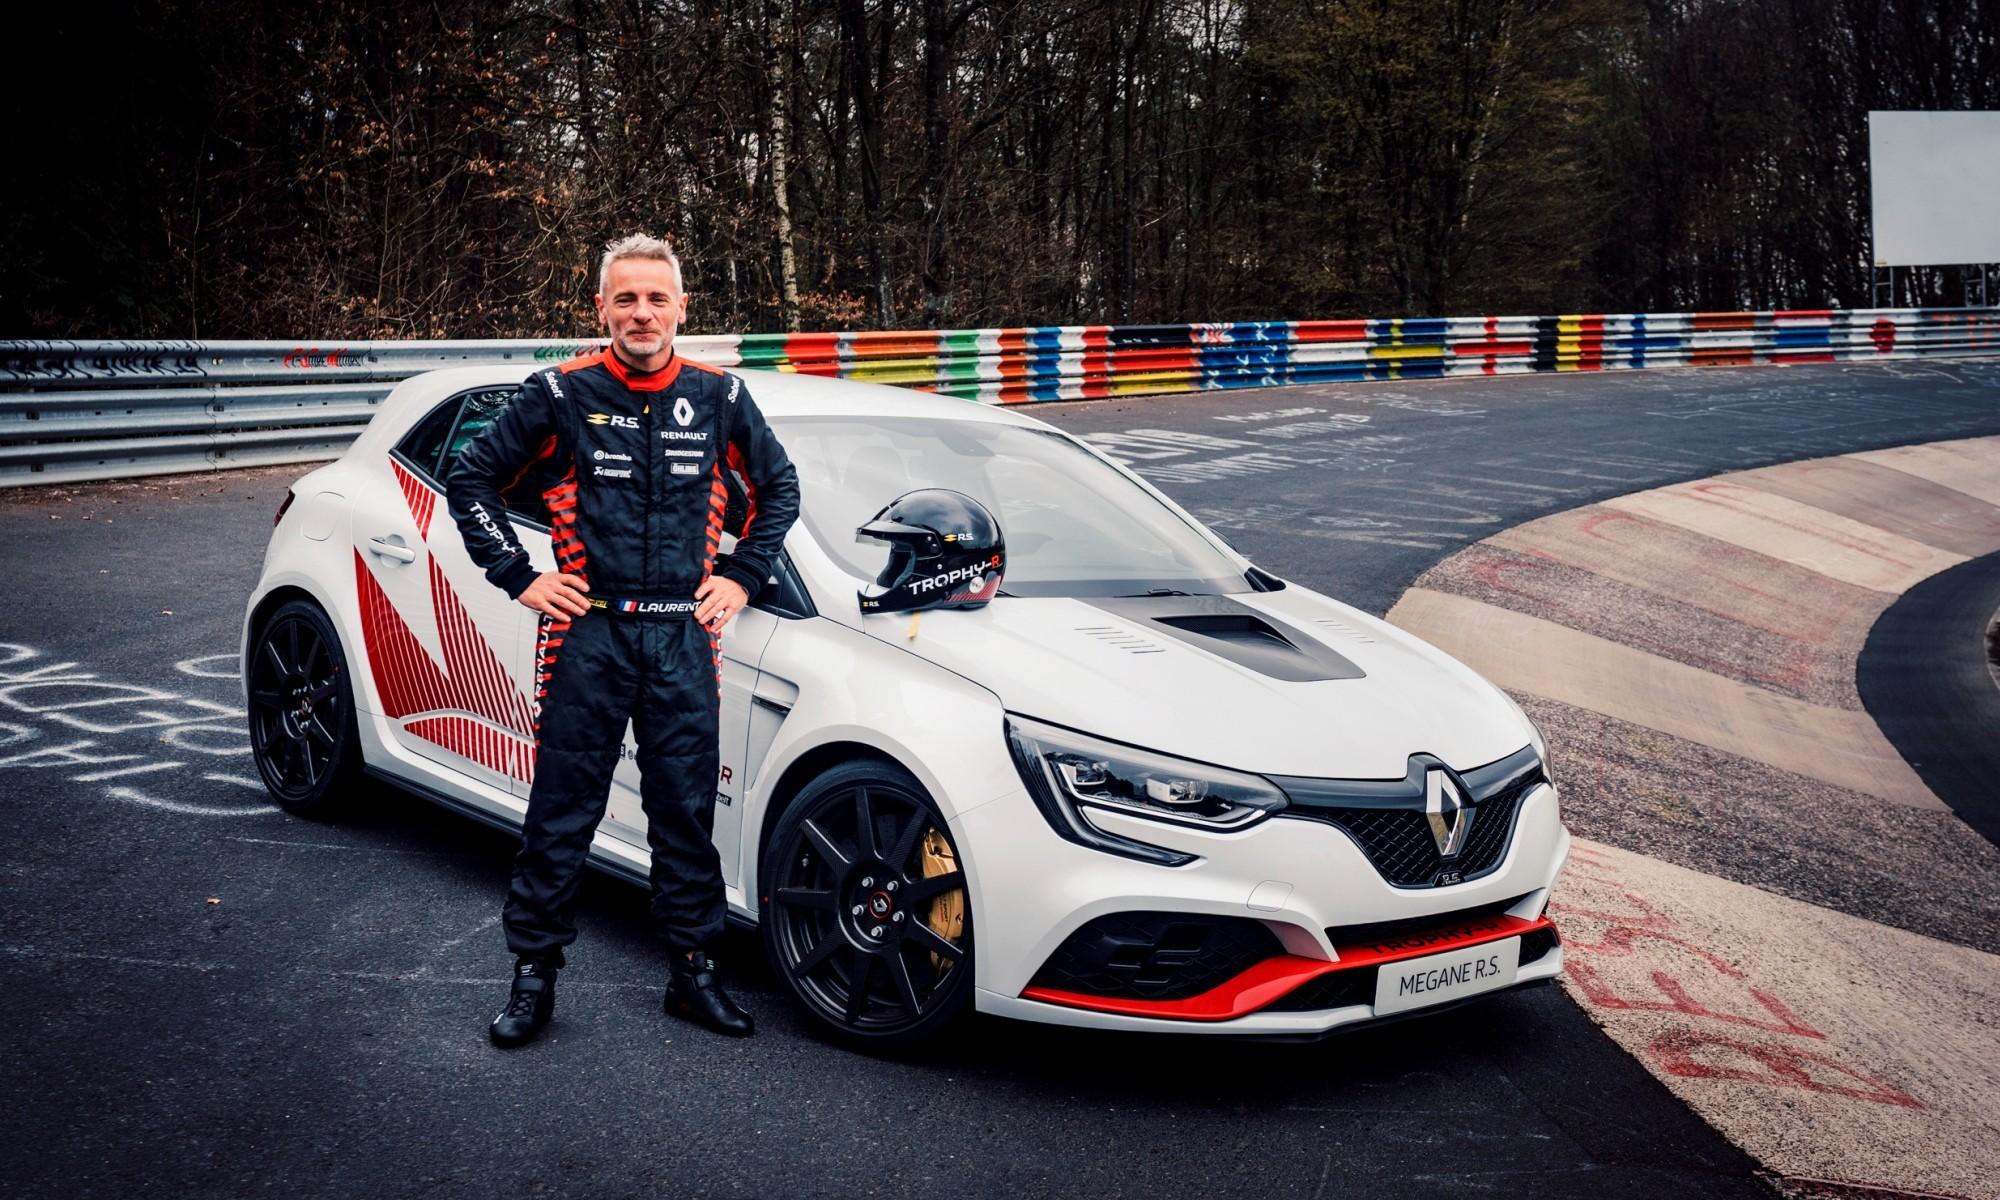 Megane Trophy-R Nurburgring record driver